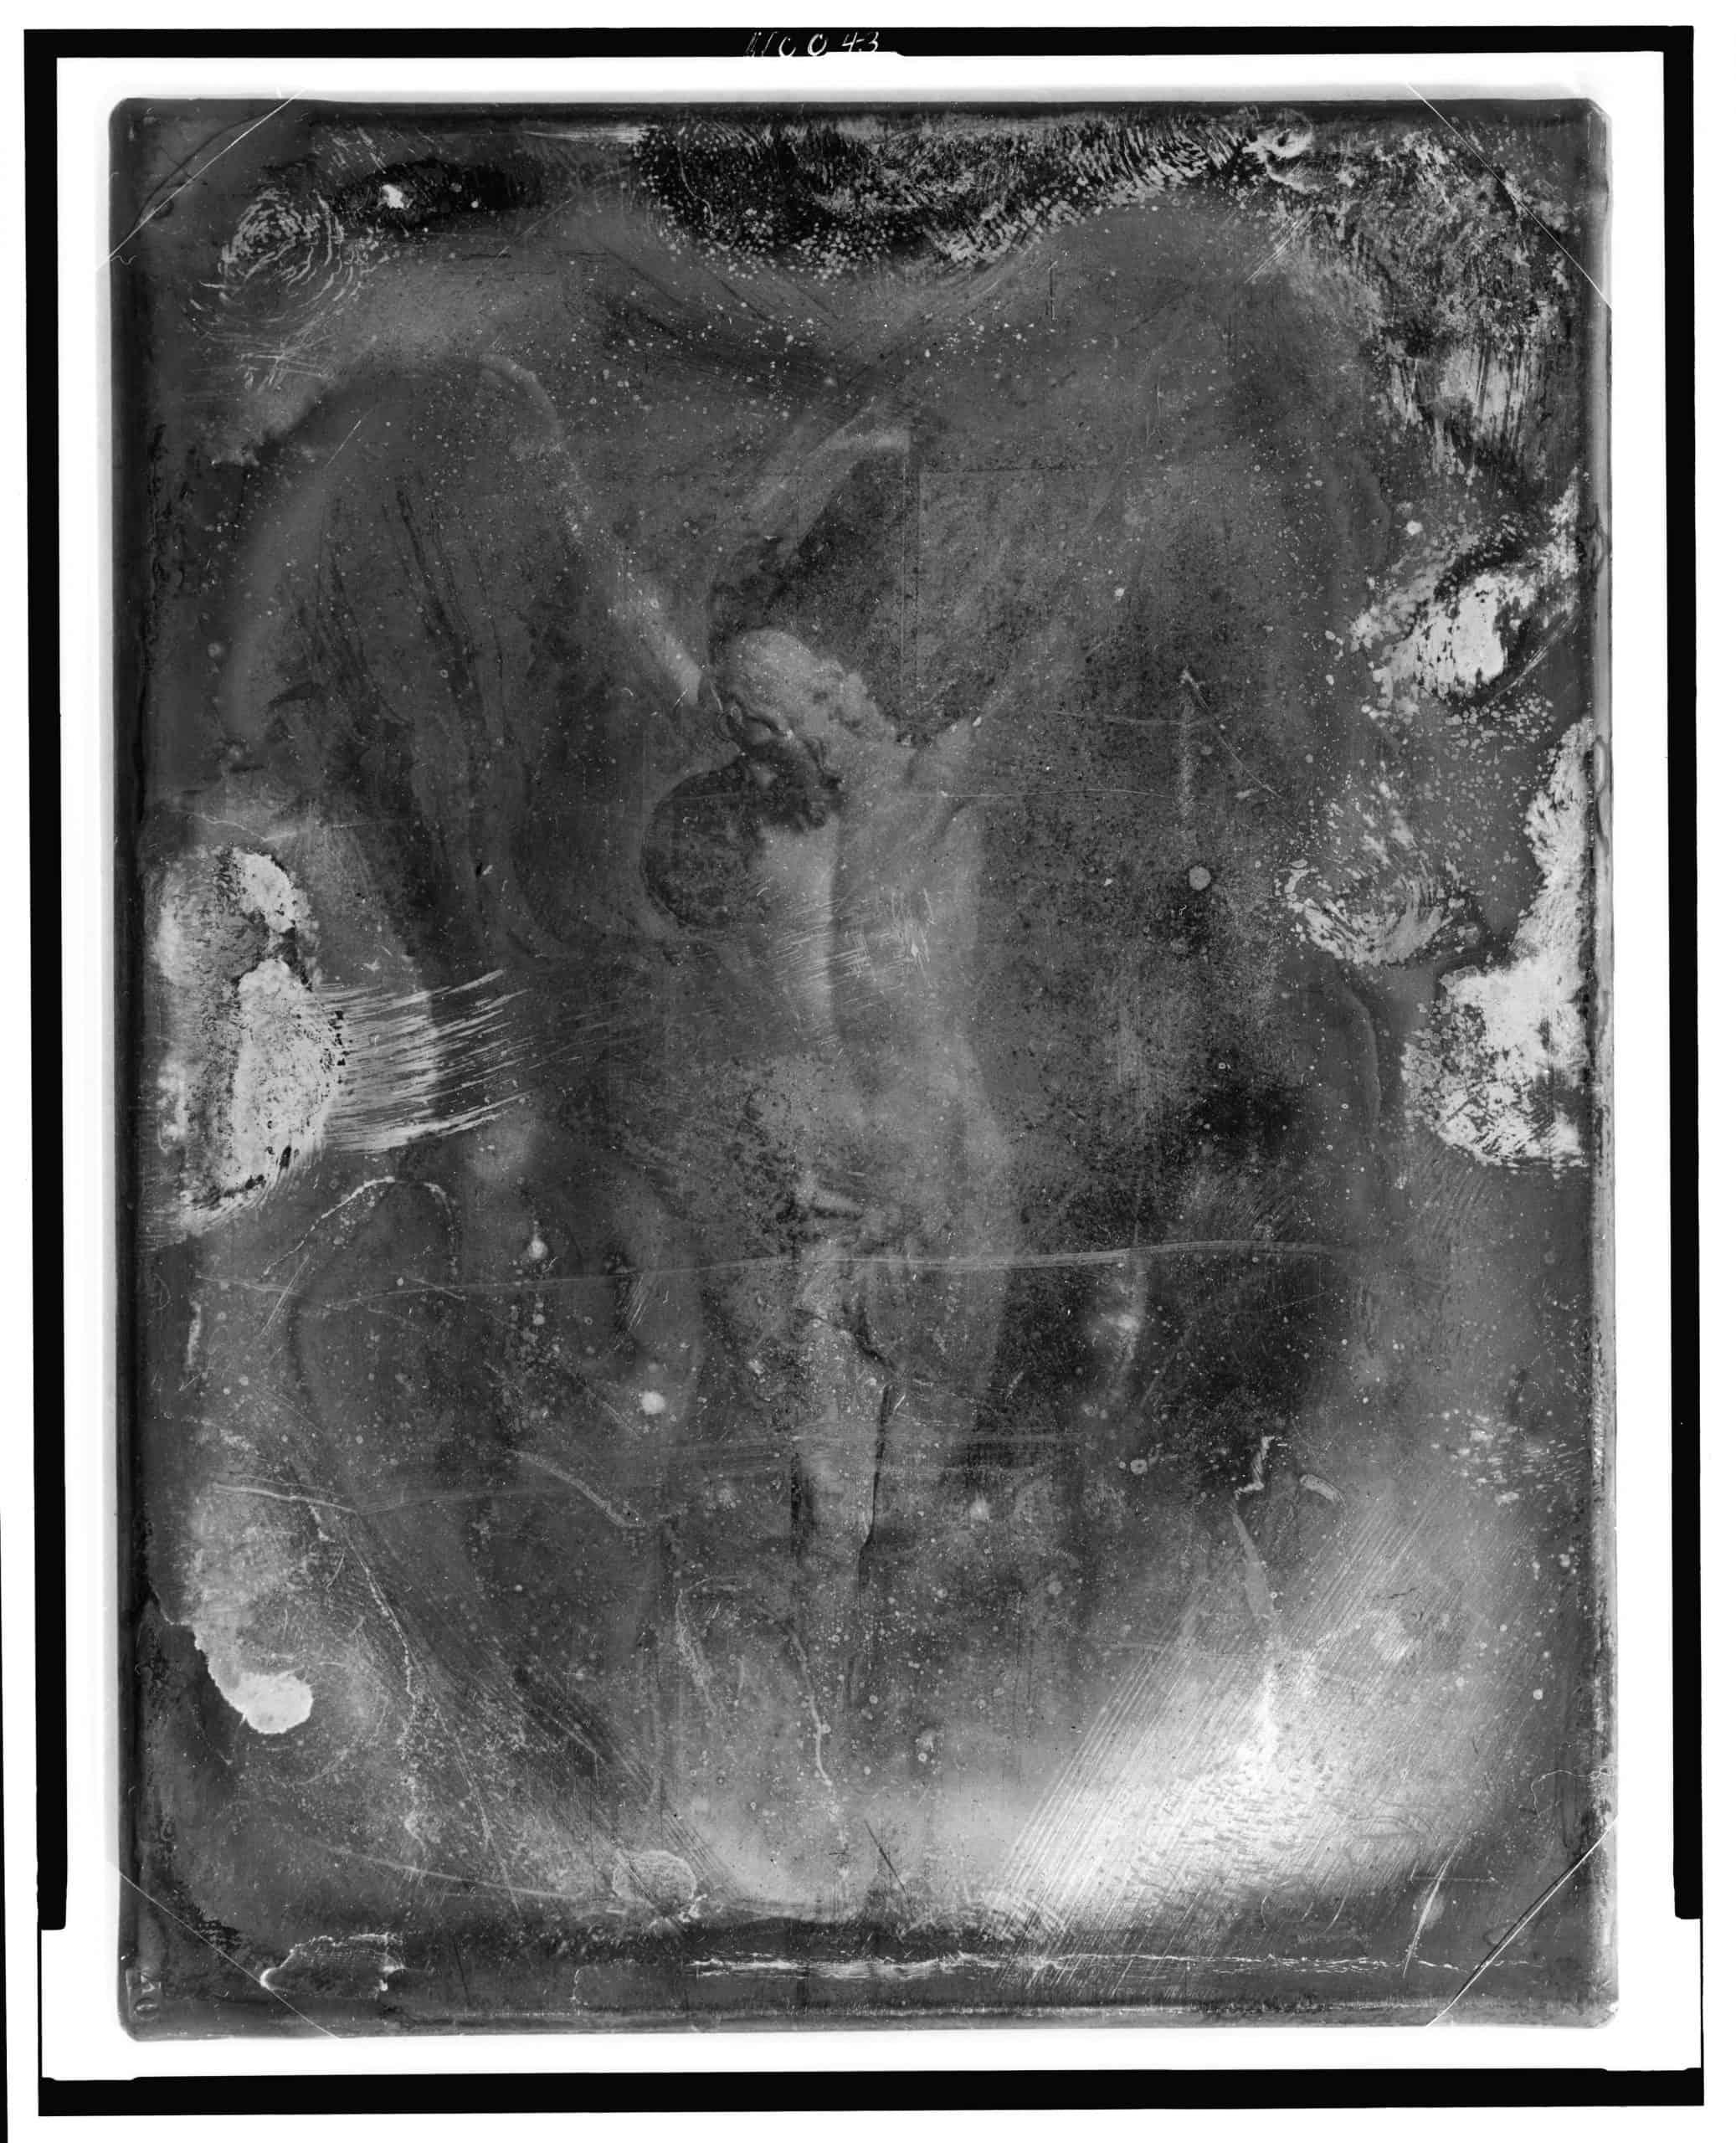 Crucifix, Mathew B. Brady, between 1844 and 1860